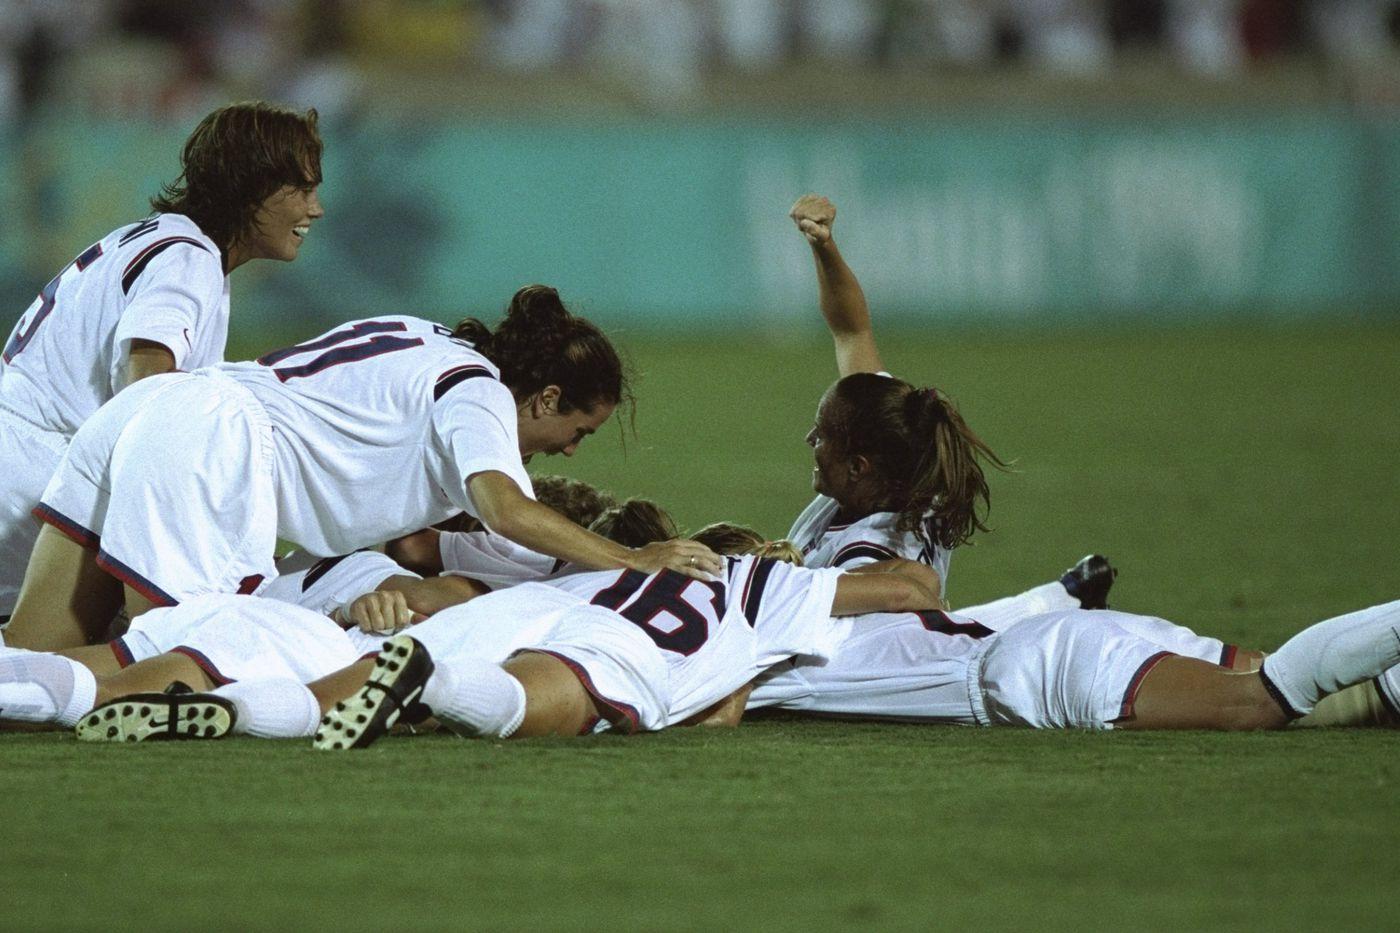 UNC Olympians: Seven Tar Heels win women's soccer gold at Atlanta 1996